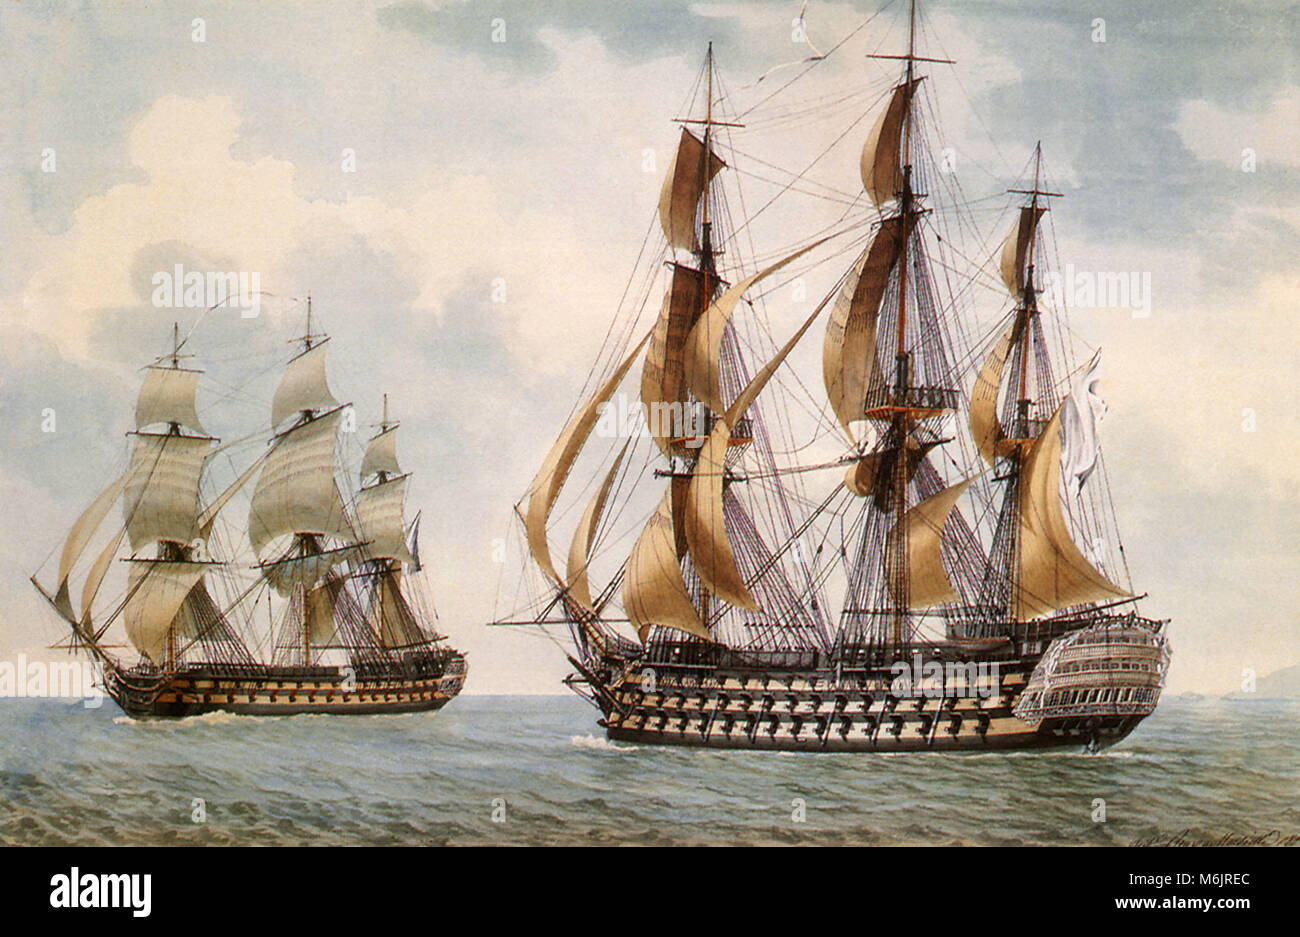 The French Ship-of-the-Line Commerce de Paris, Roux, Ange Joseph Antoine, 1804. Stock Photo